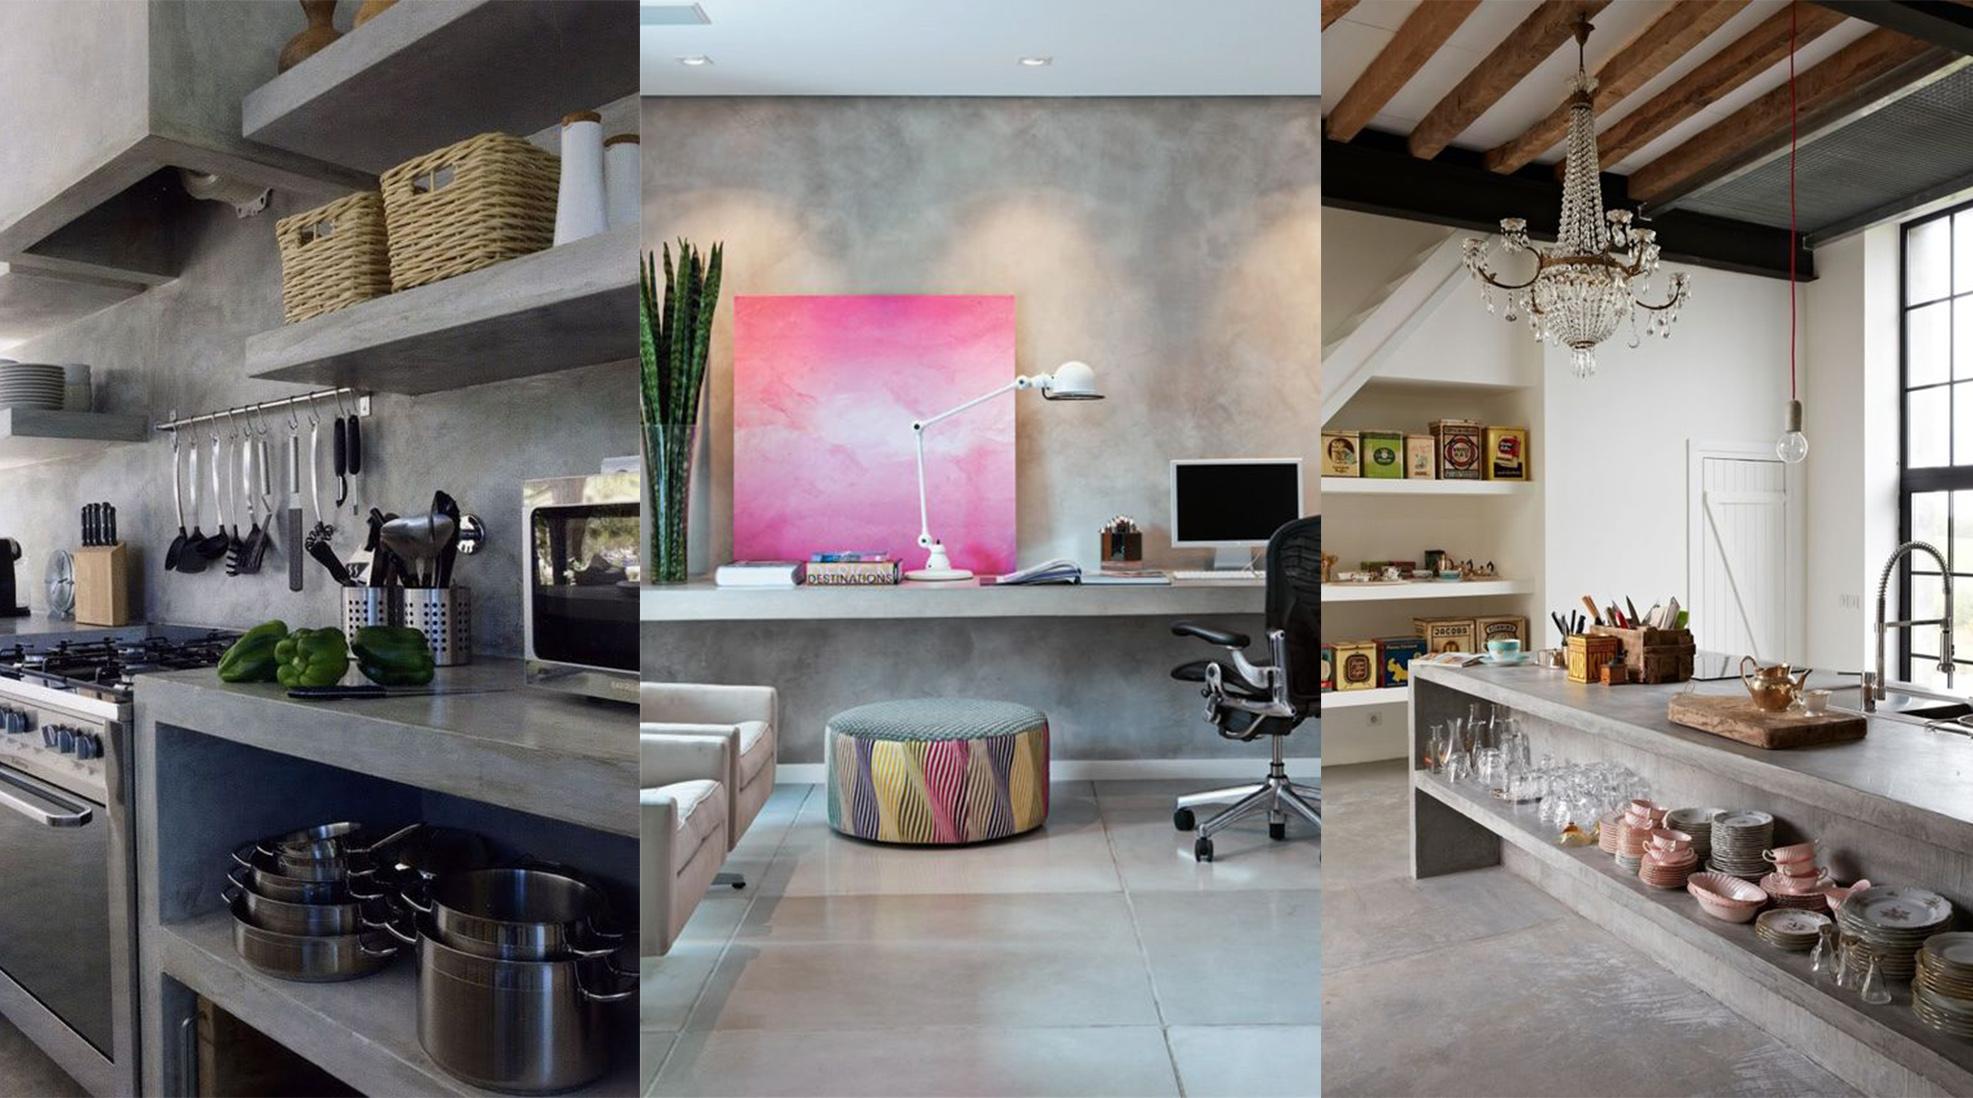 beton cire deco beton cire cuisine charmant video beton cire sur faience mercadier eleonore. Black Bedroom Furniture Sets. Home Design Ideas